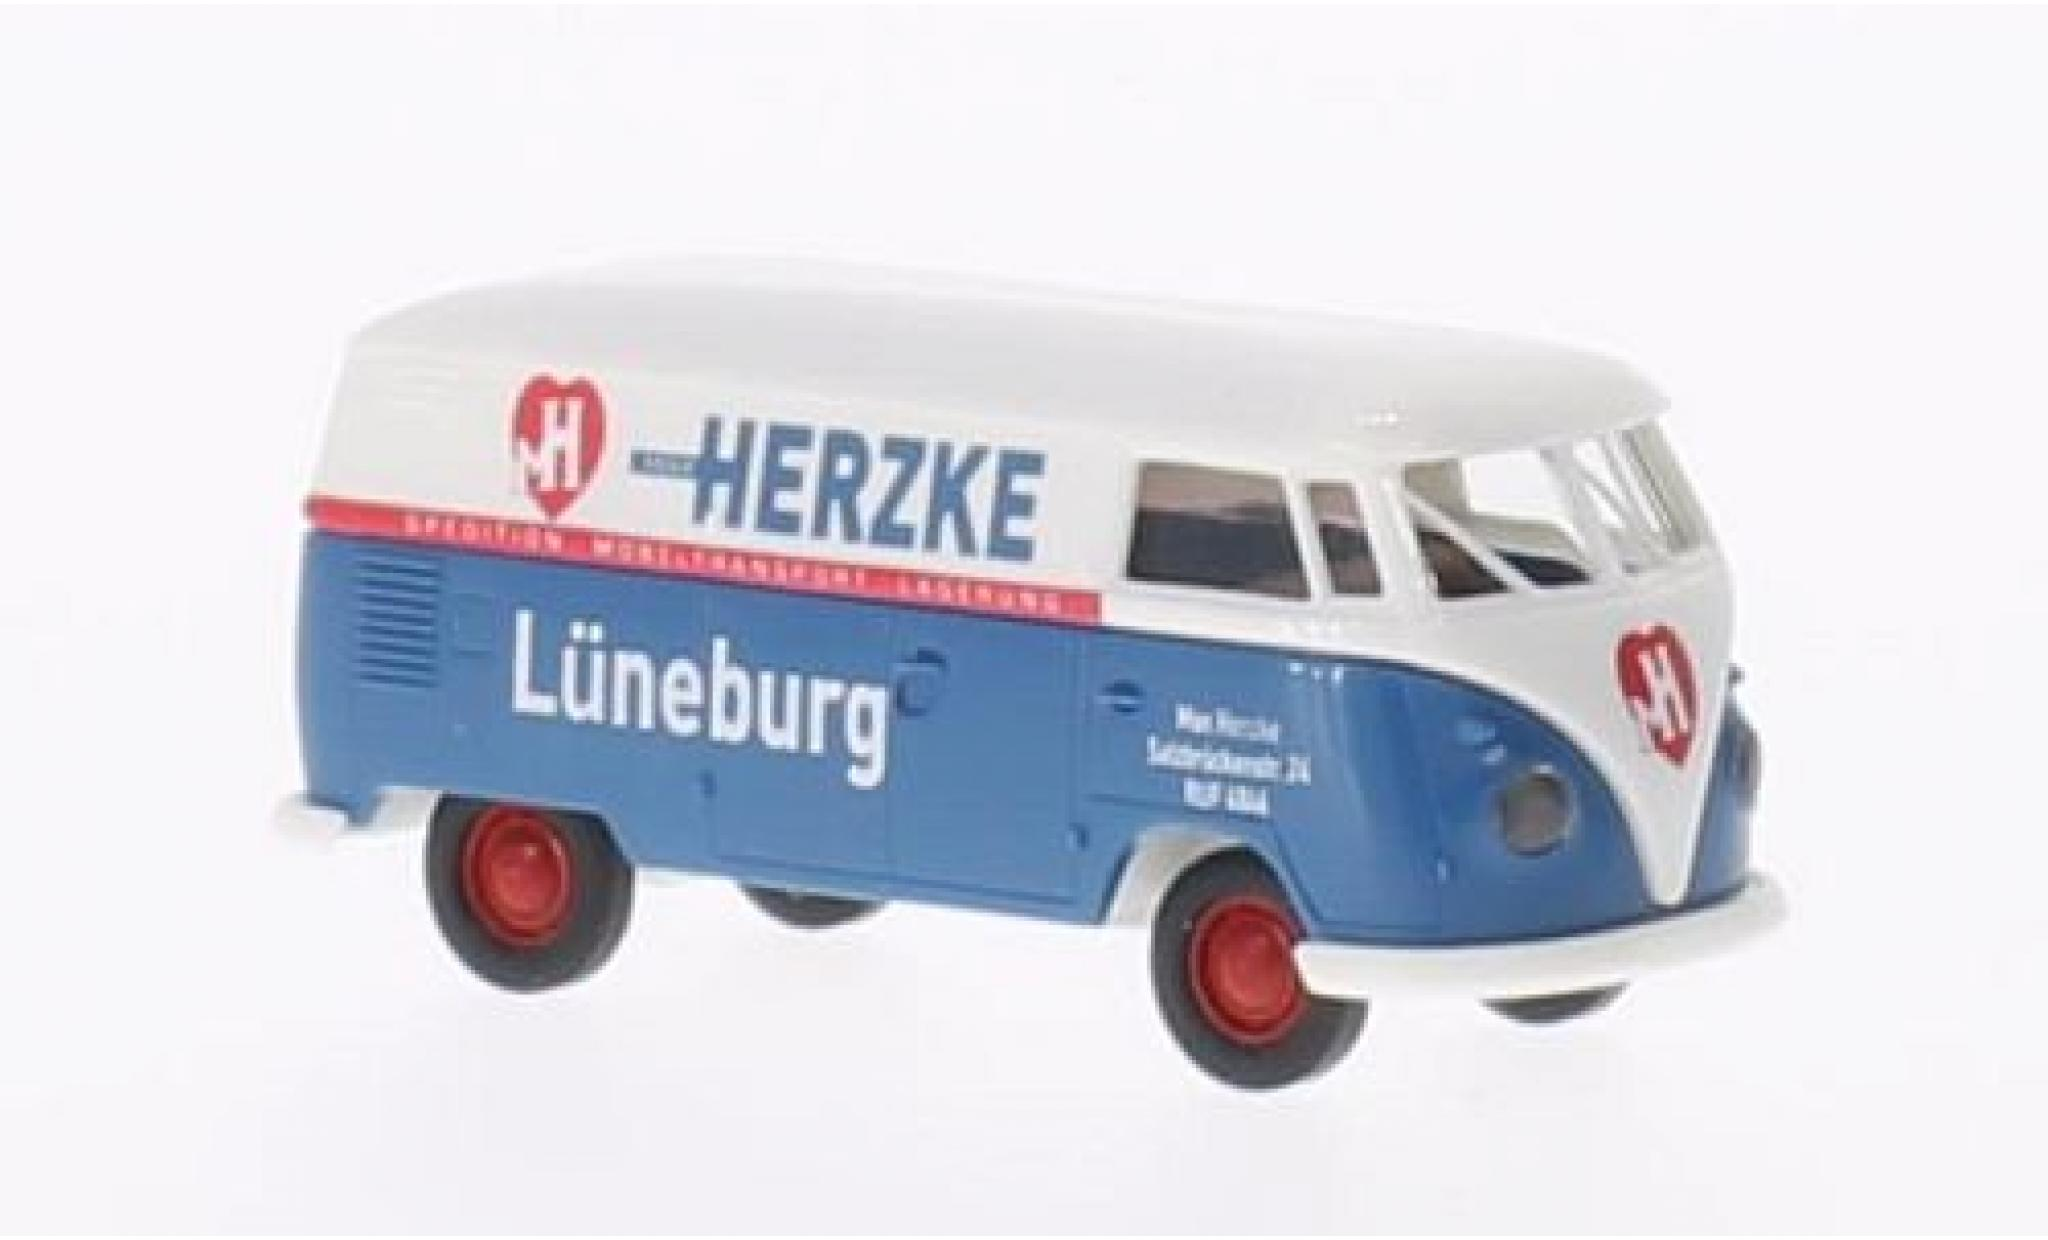 Volkswagen T1 1/87 Brekina a Max Herzke fourgon